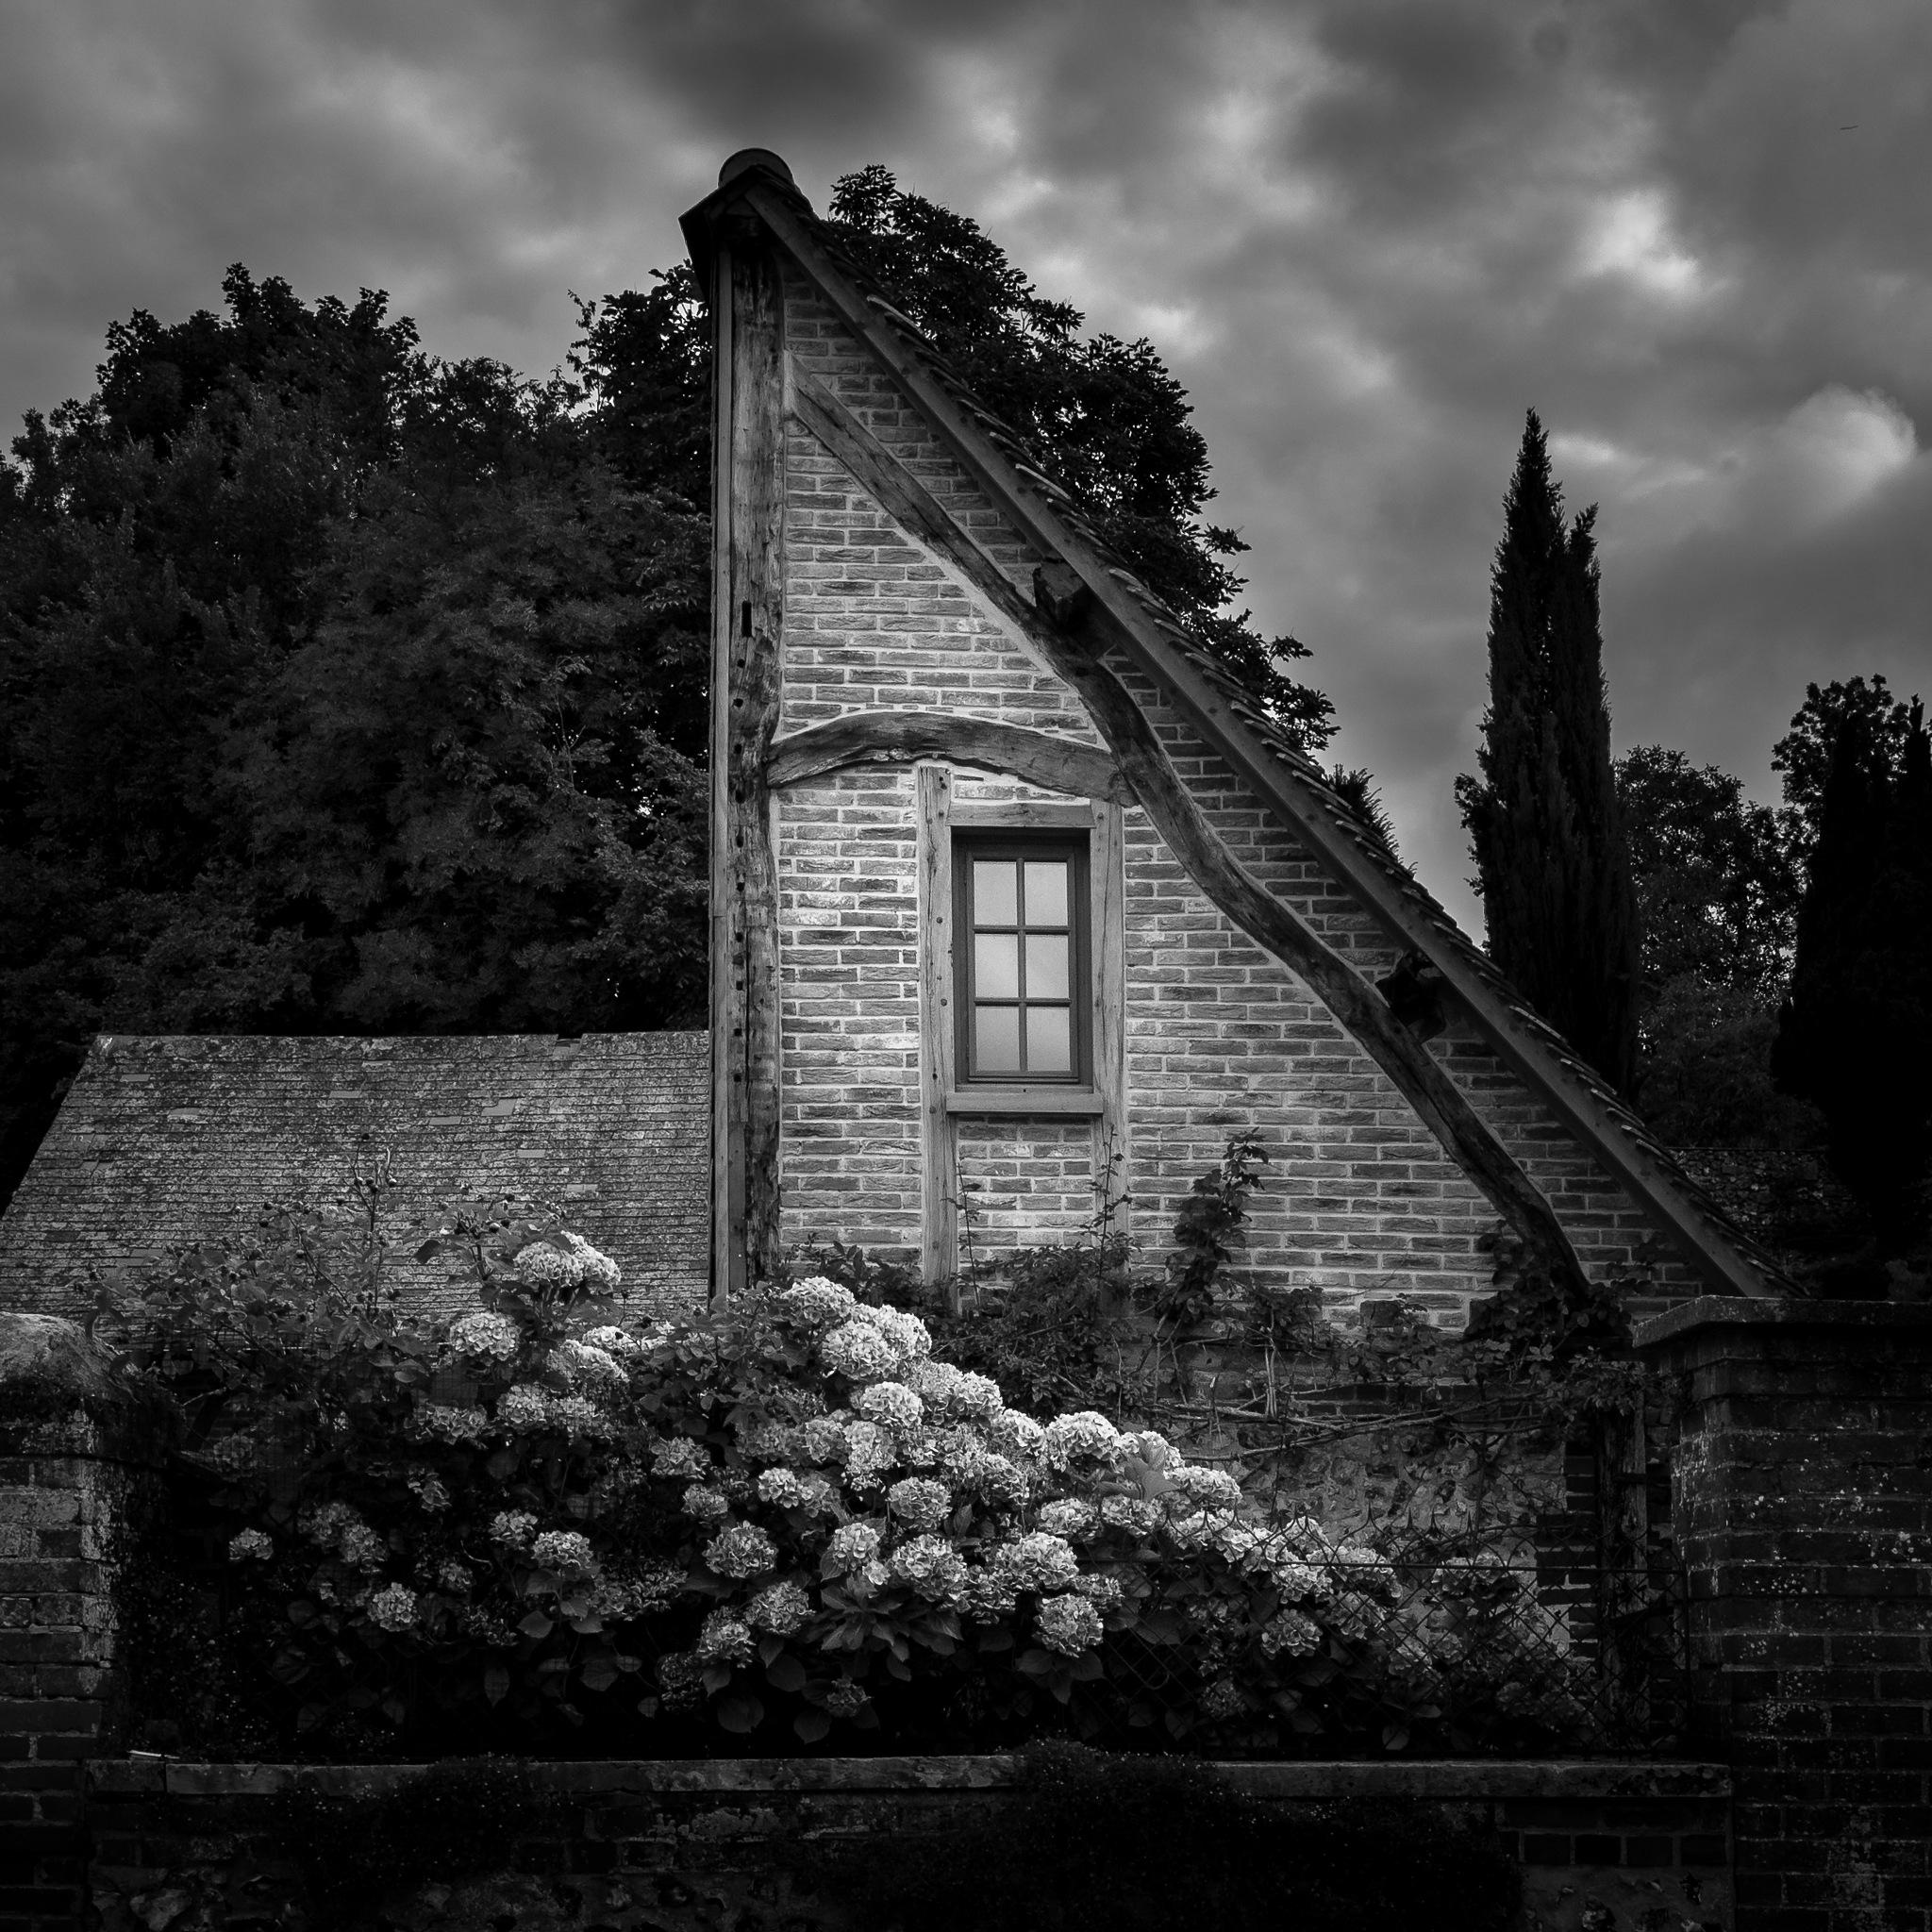 Triangle House by Destino